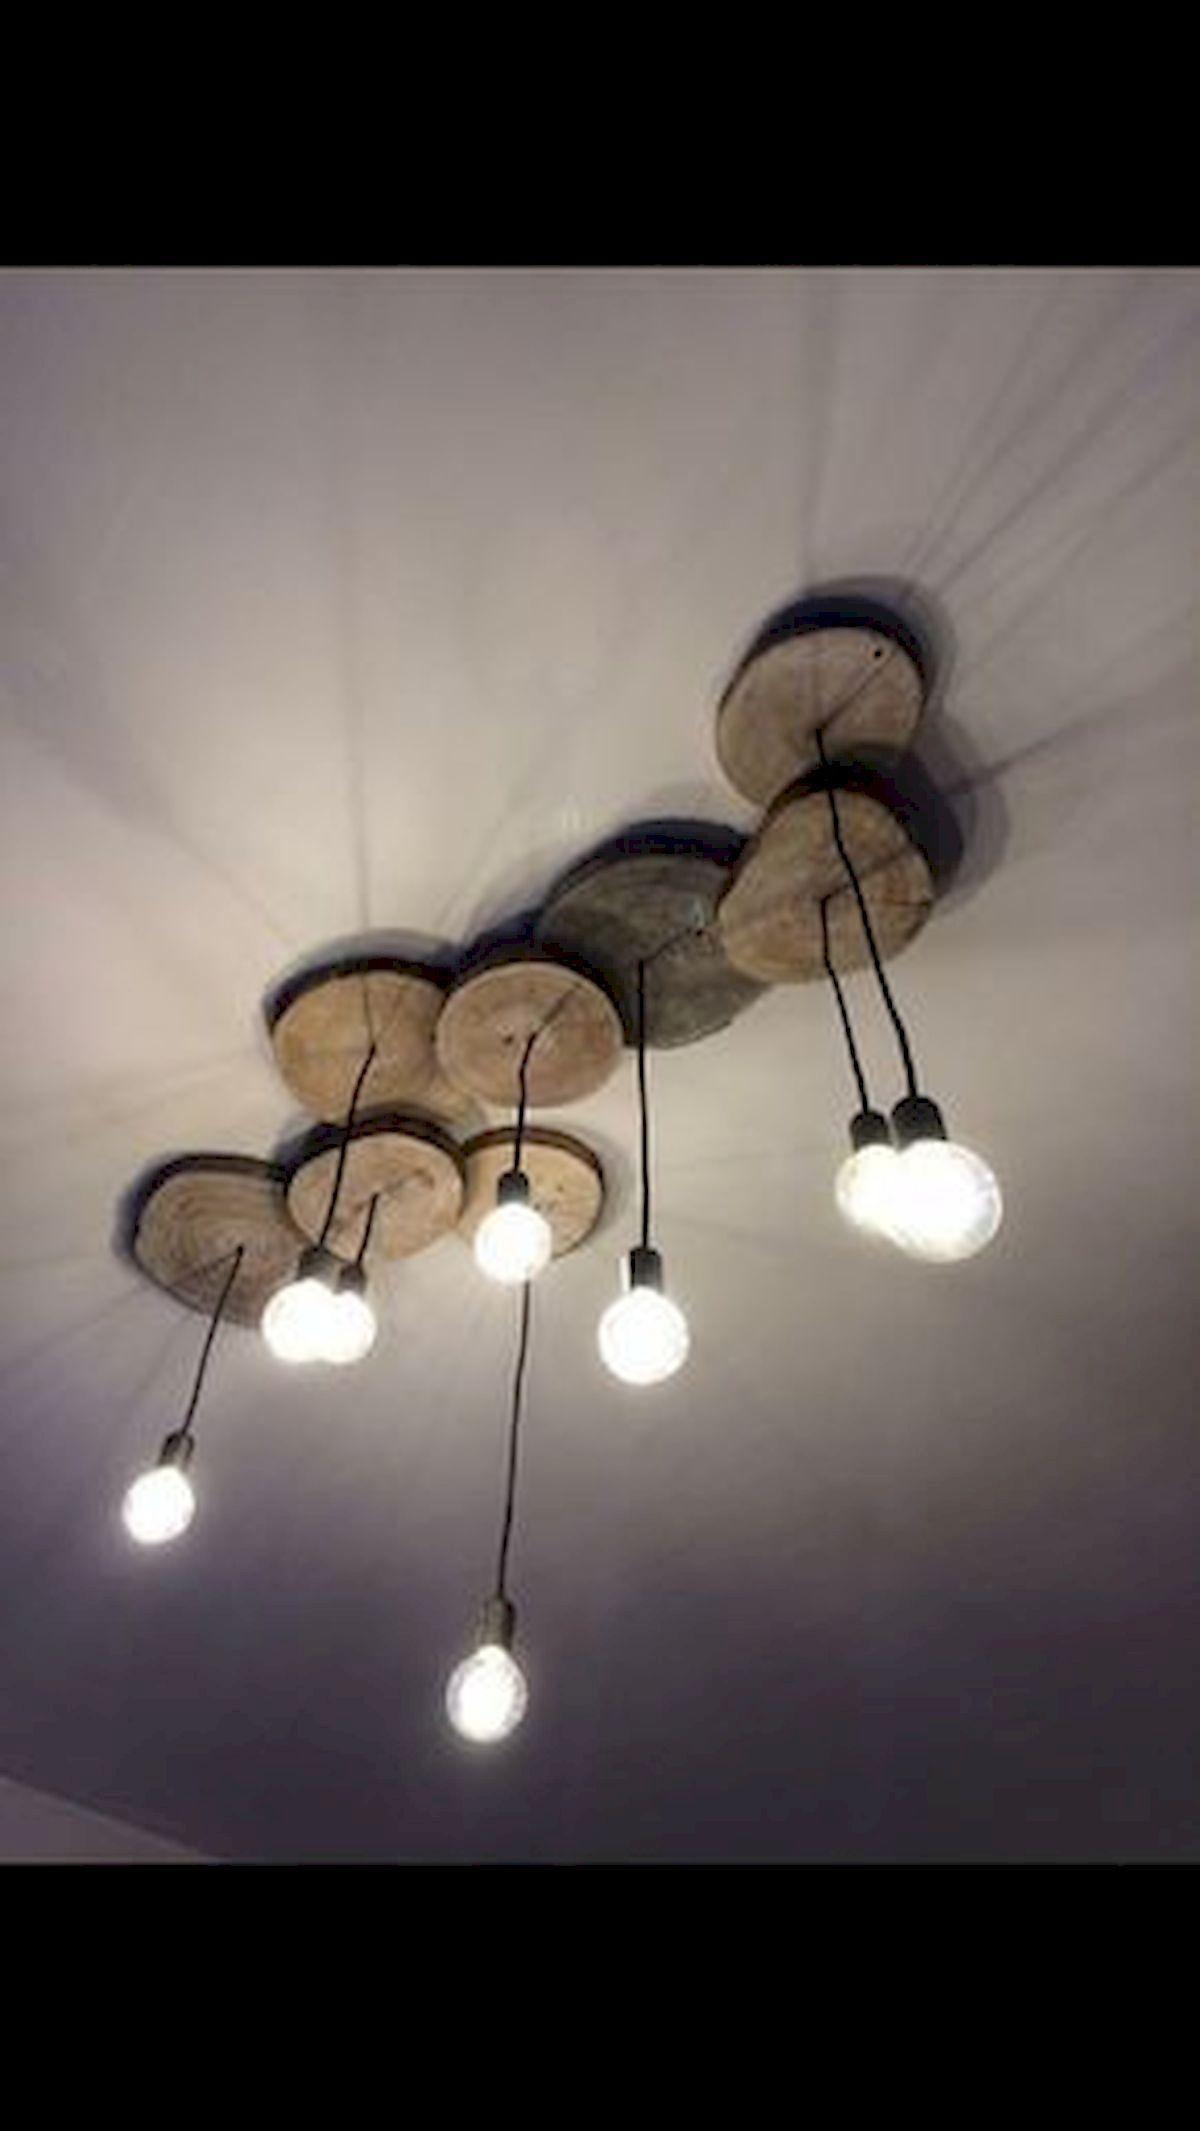 20 Best DIY Home Decor Lamp Ideas | Diy wall decor, Diy wall